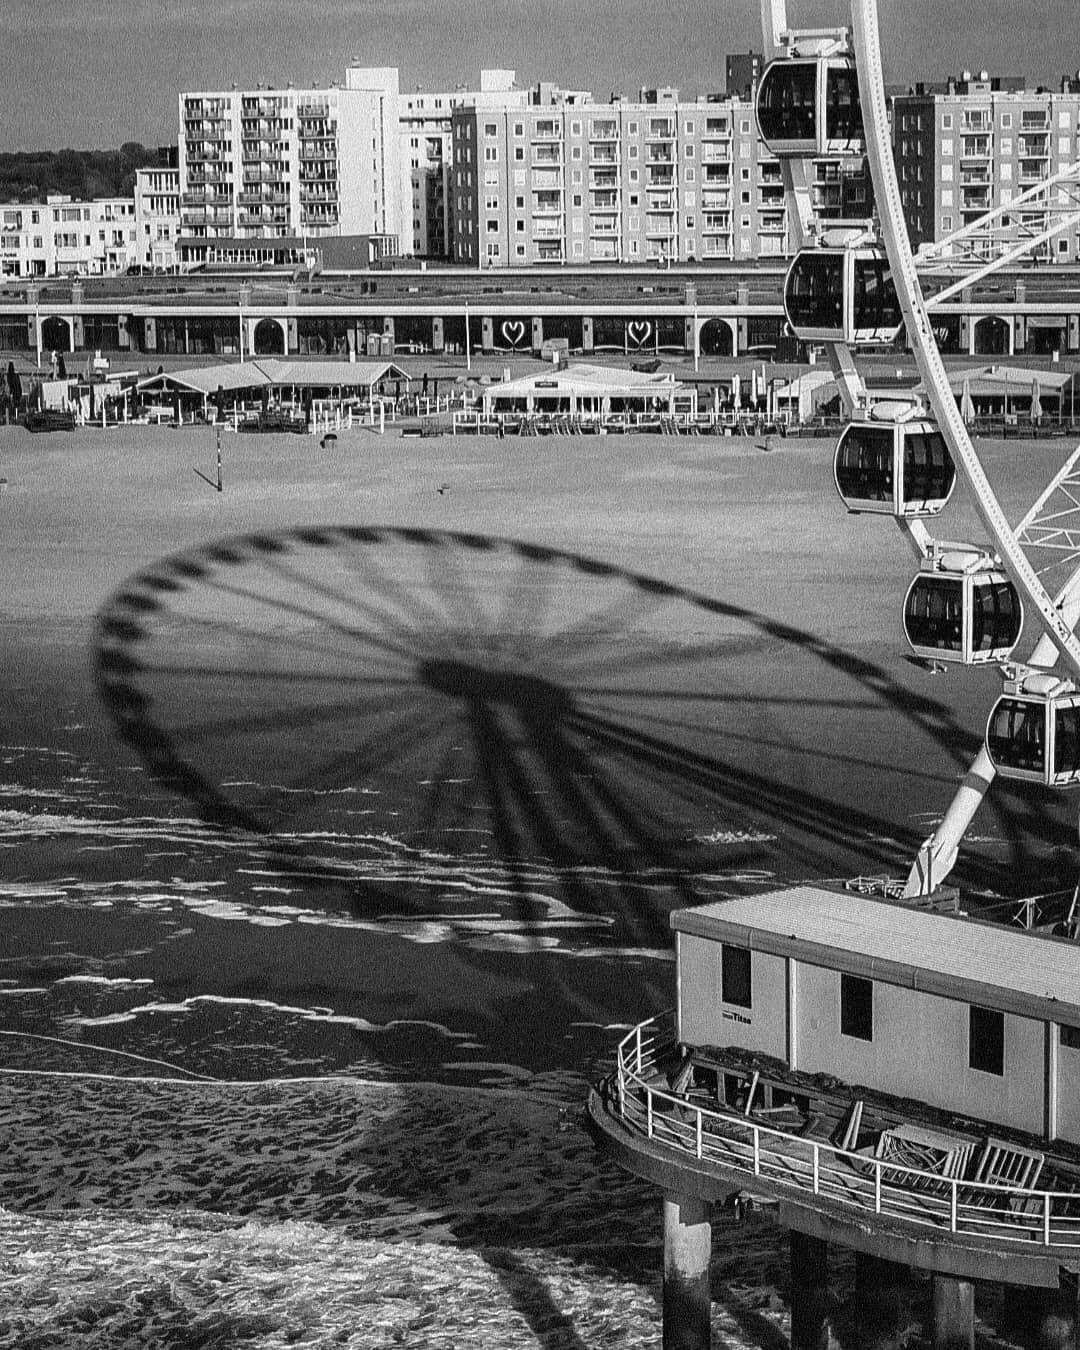 A day at den Haag.  #denhaag #beach #beachvibes #beachlife #lifeisbetteratthebeach #bw #print #printsforsale #sea #ferriswheel #photography #photographers #photoediting #photographylovers #streetphotography #streetsineurope #streetclassics #specialsgallery #forevermagazine #classicsmagazine